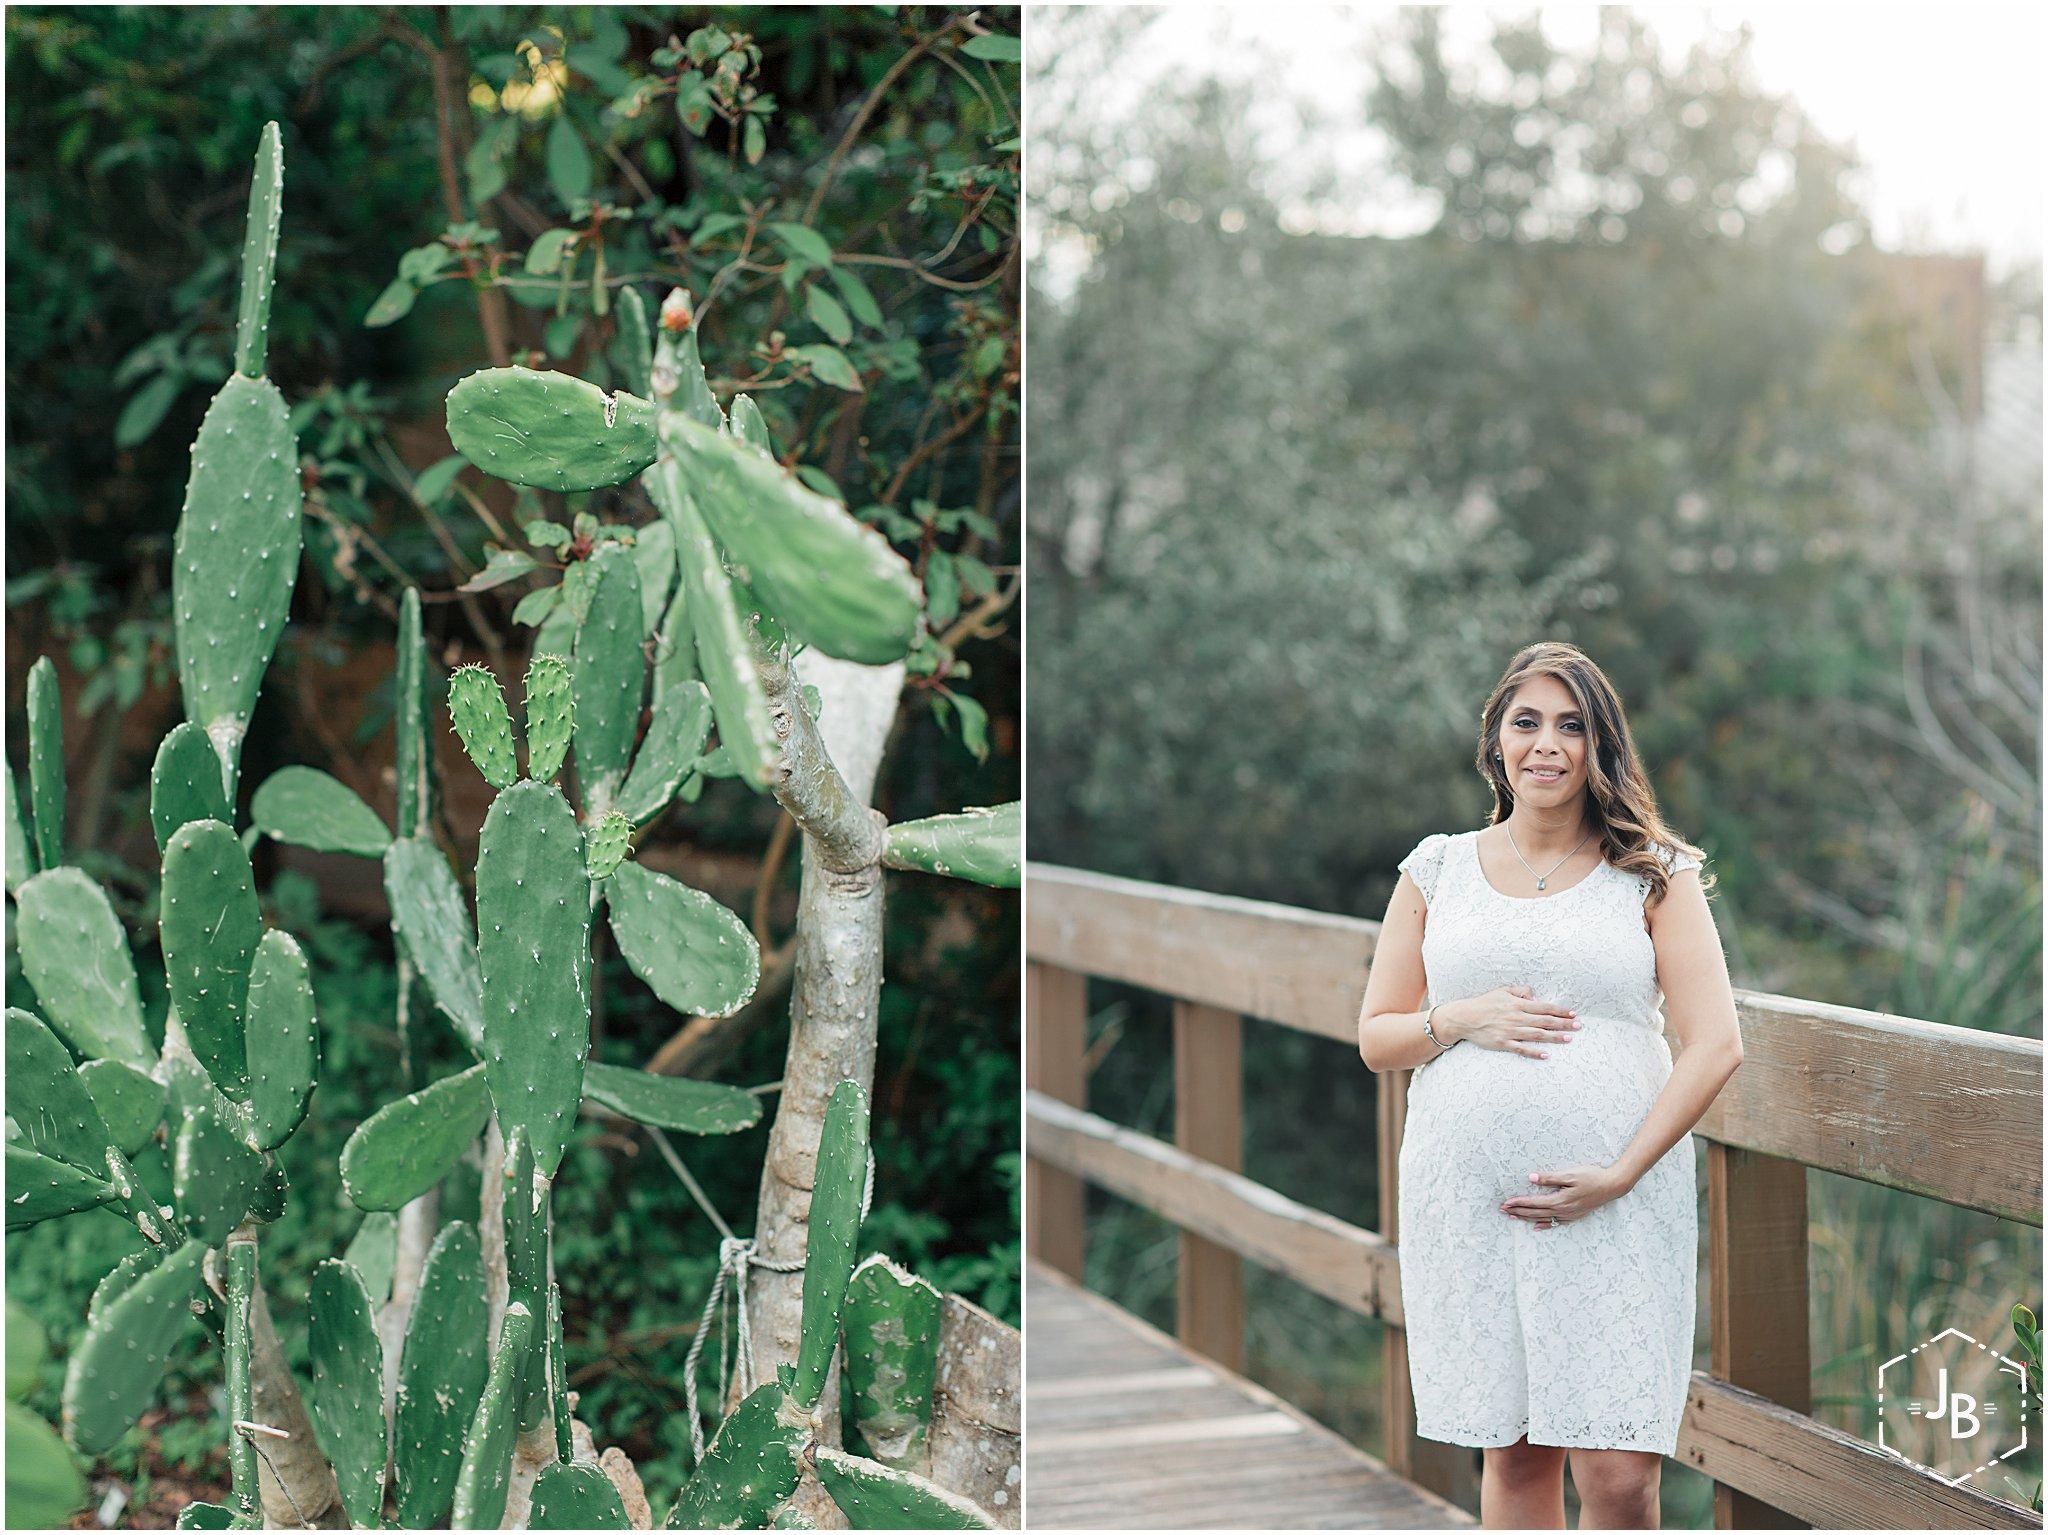 WeddingandEngagementFloridaPhotographer_1400.jpg